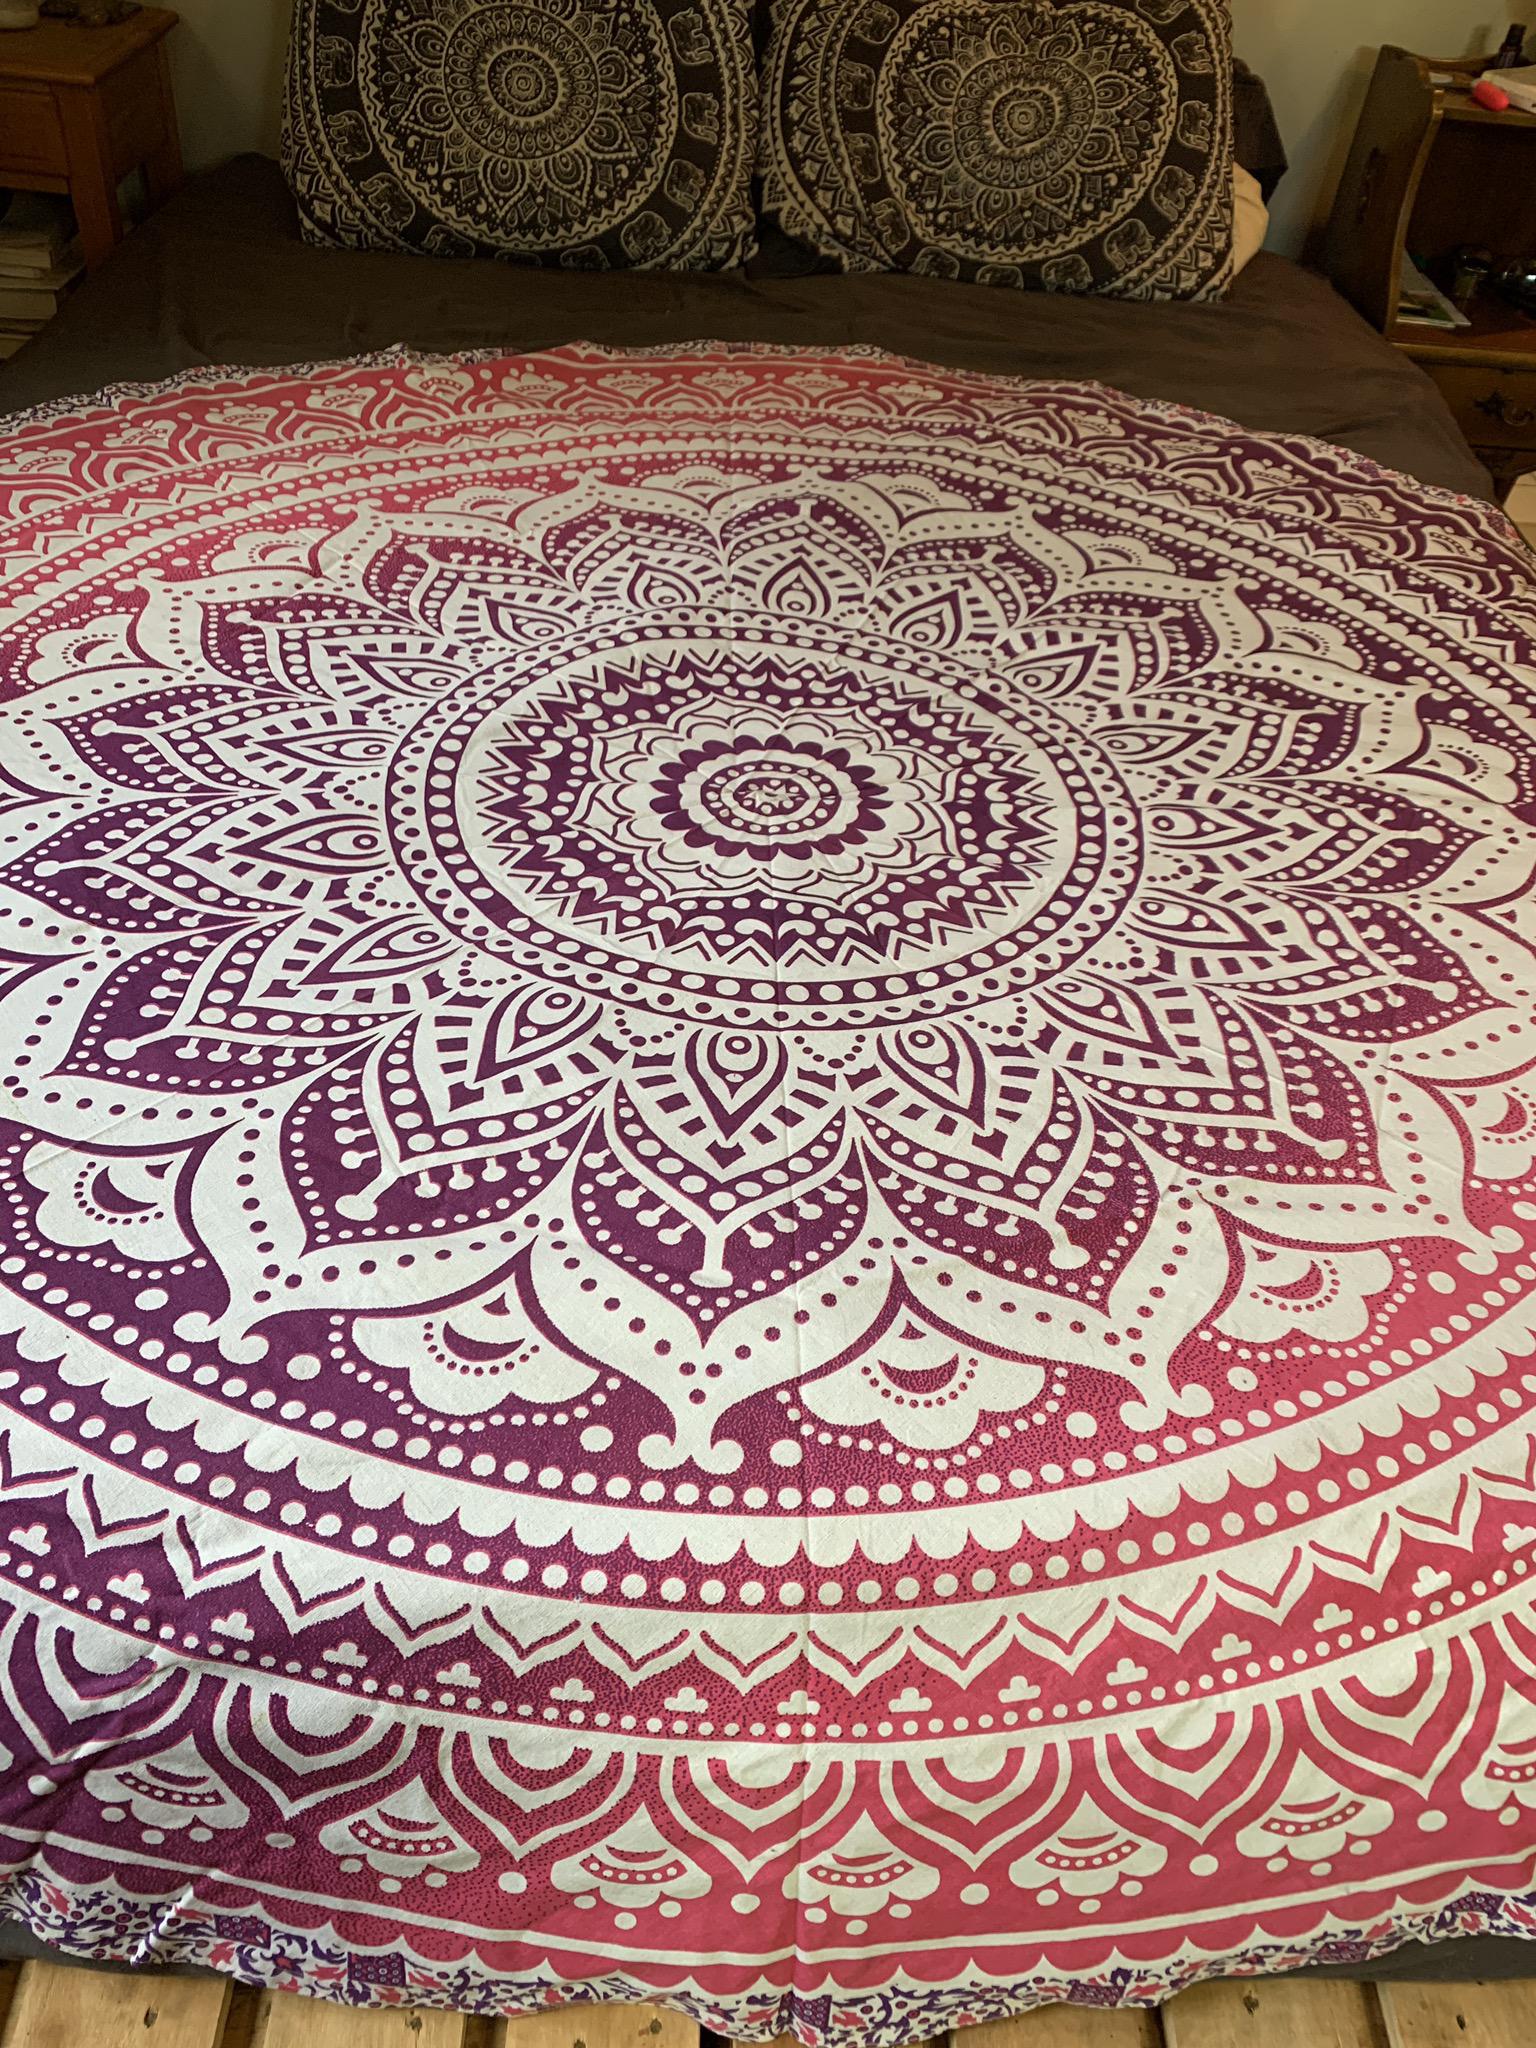 Large Pink Mandala Tapestry 00085